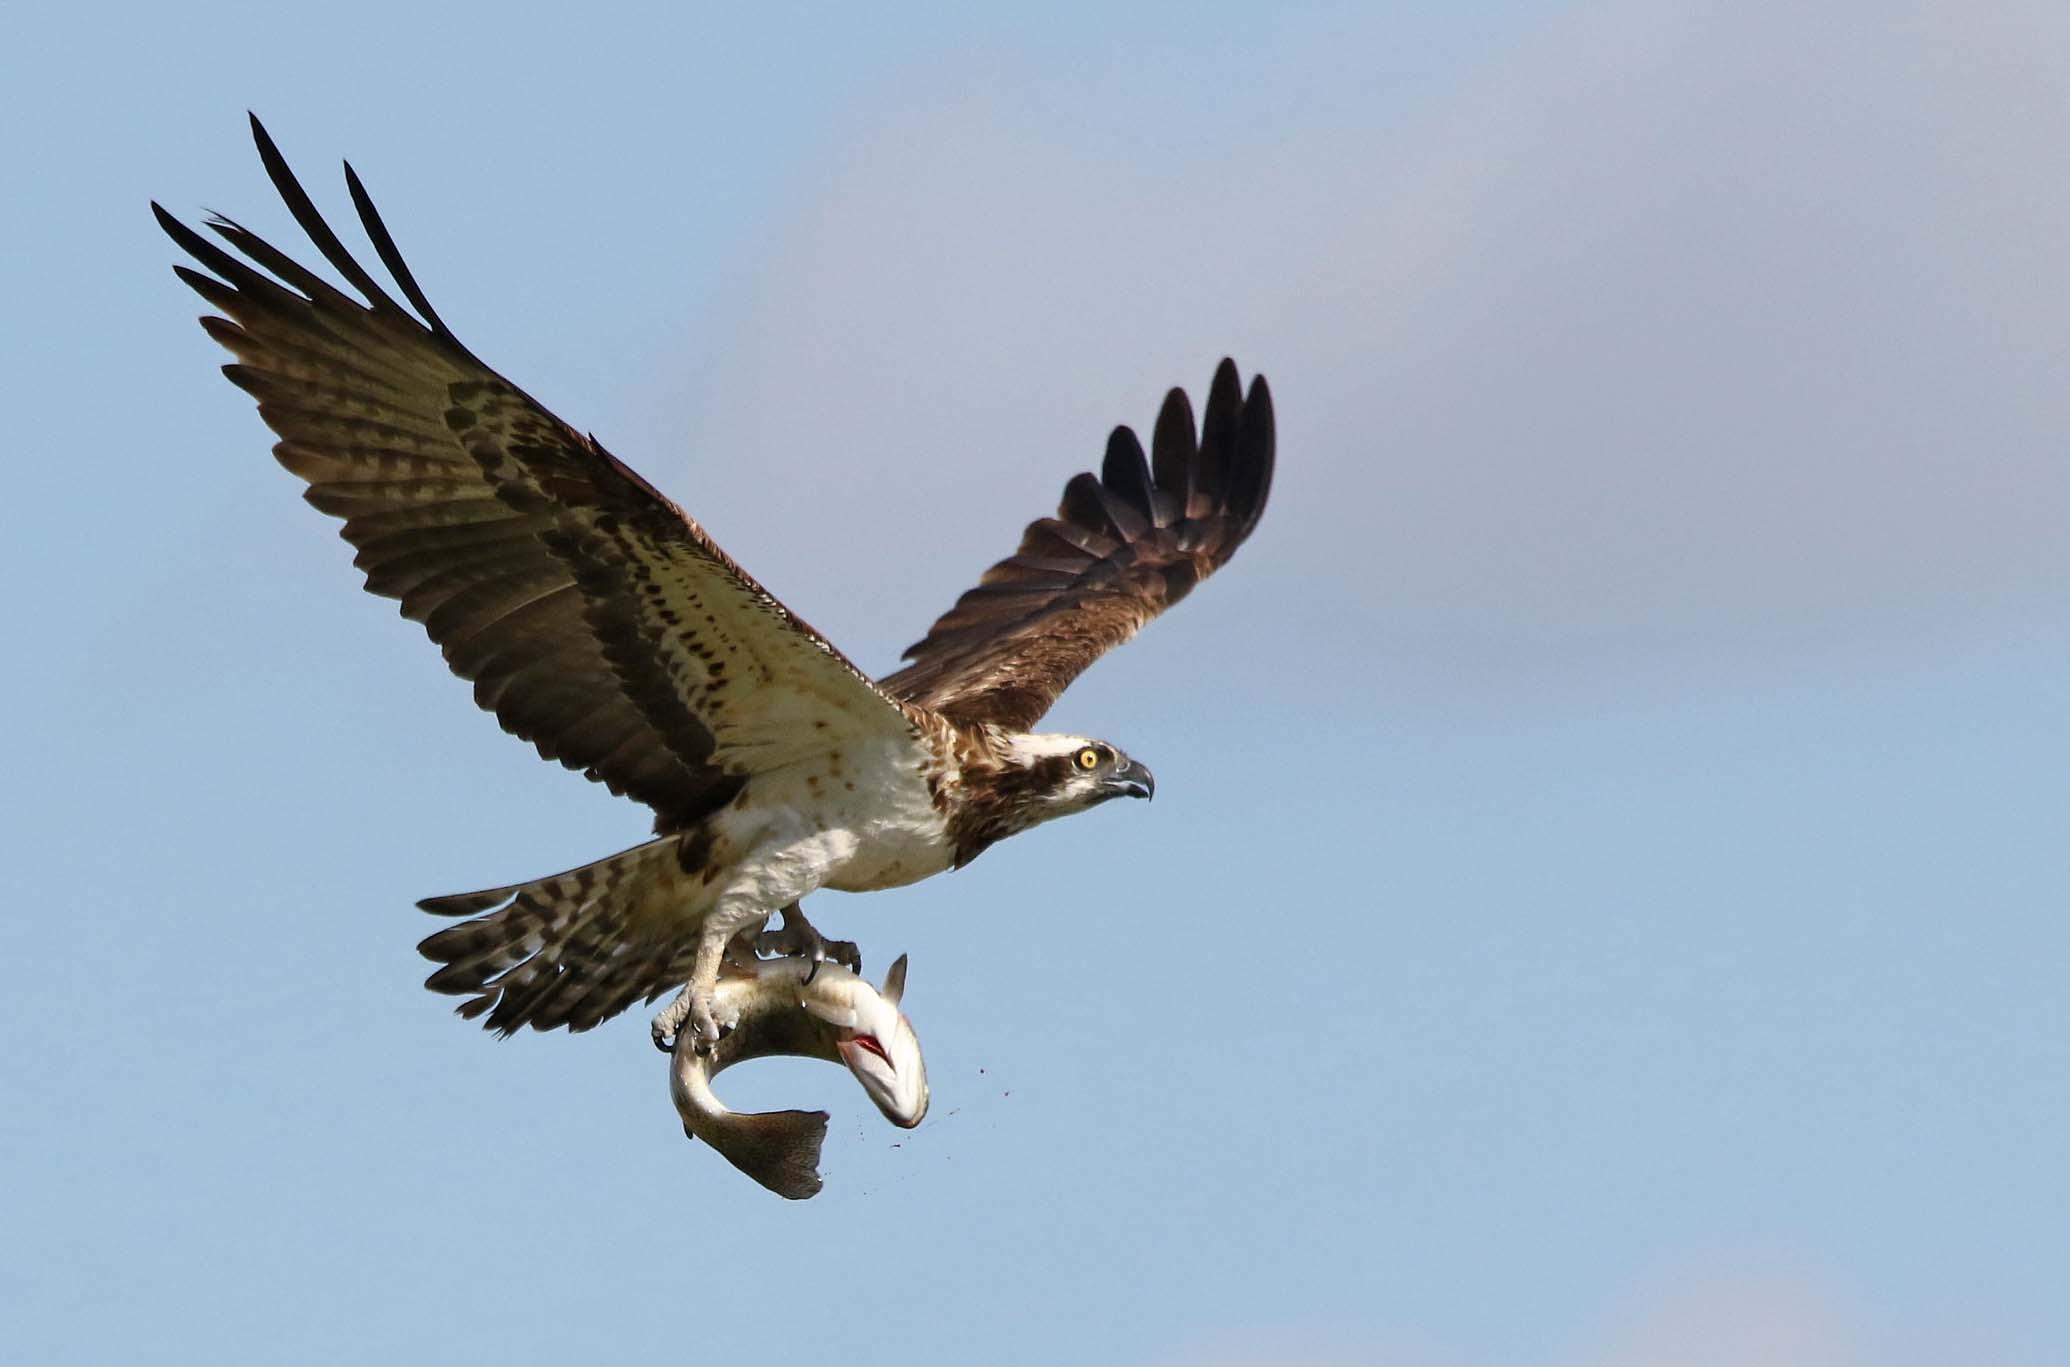 Herts Bird Club | Herts Bird Club Welcome